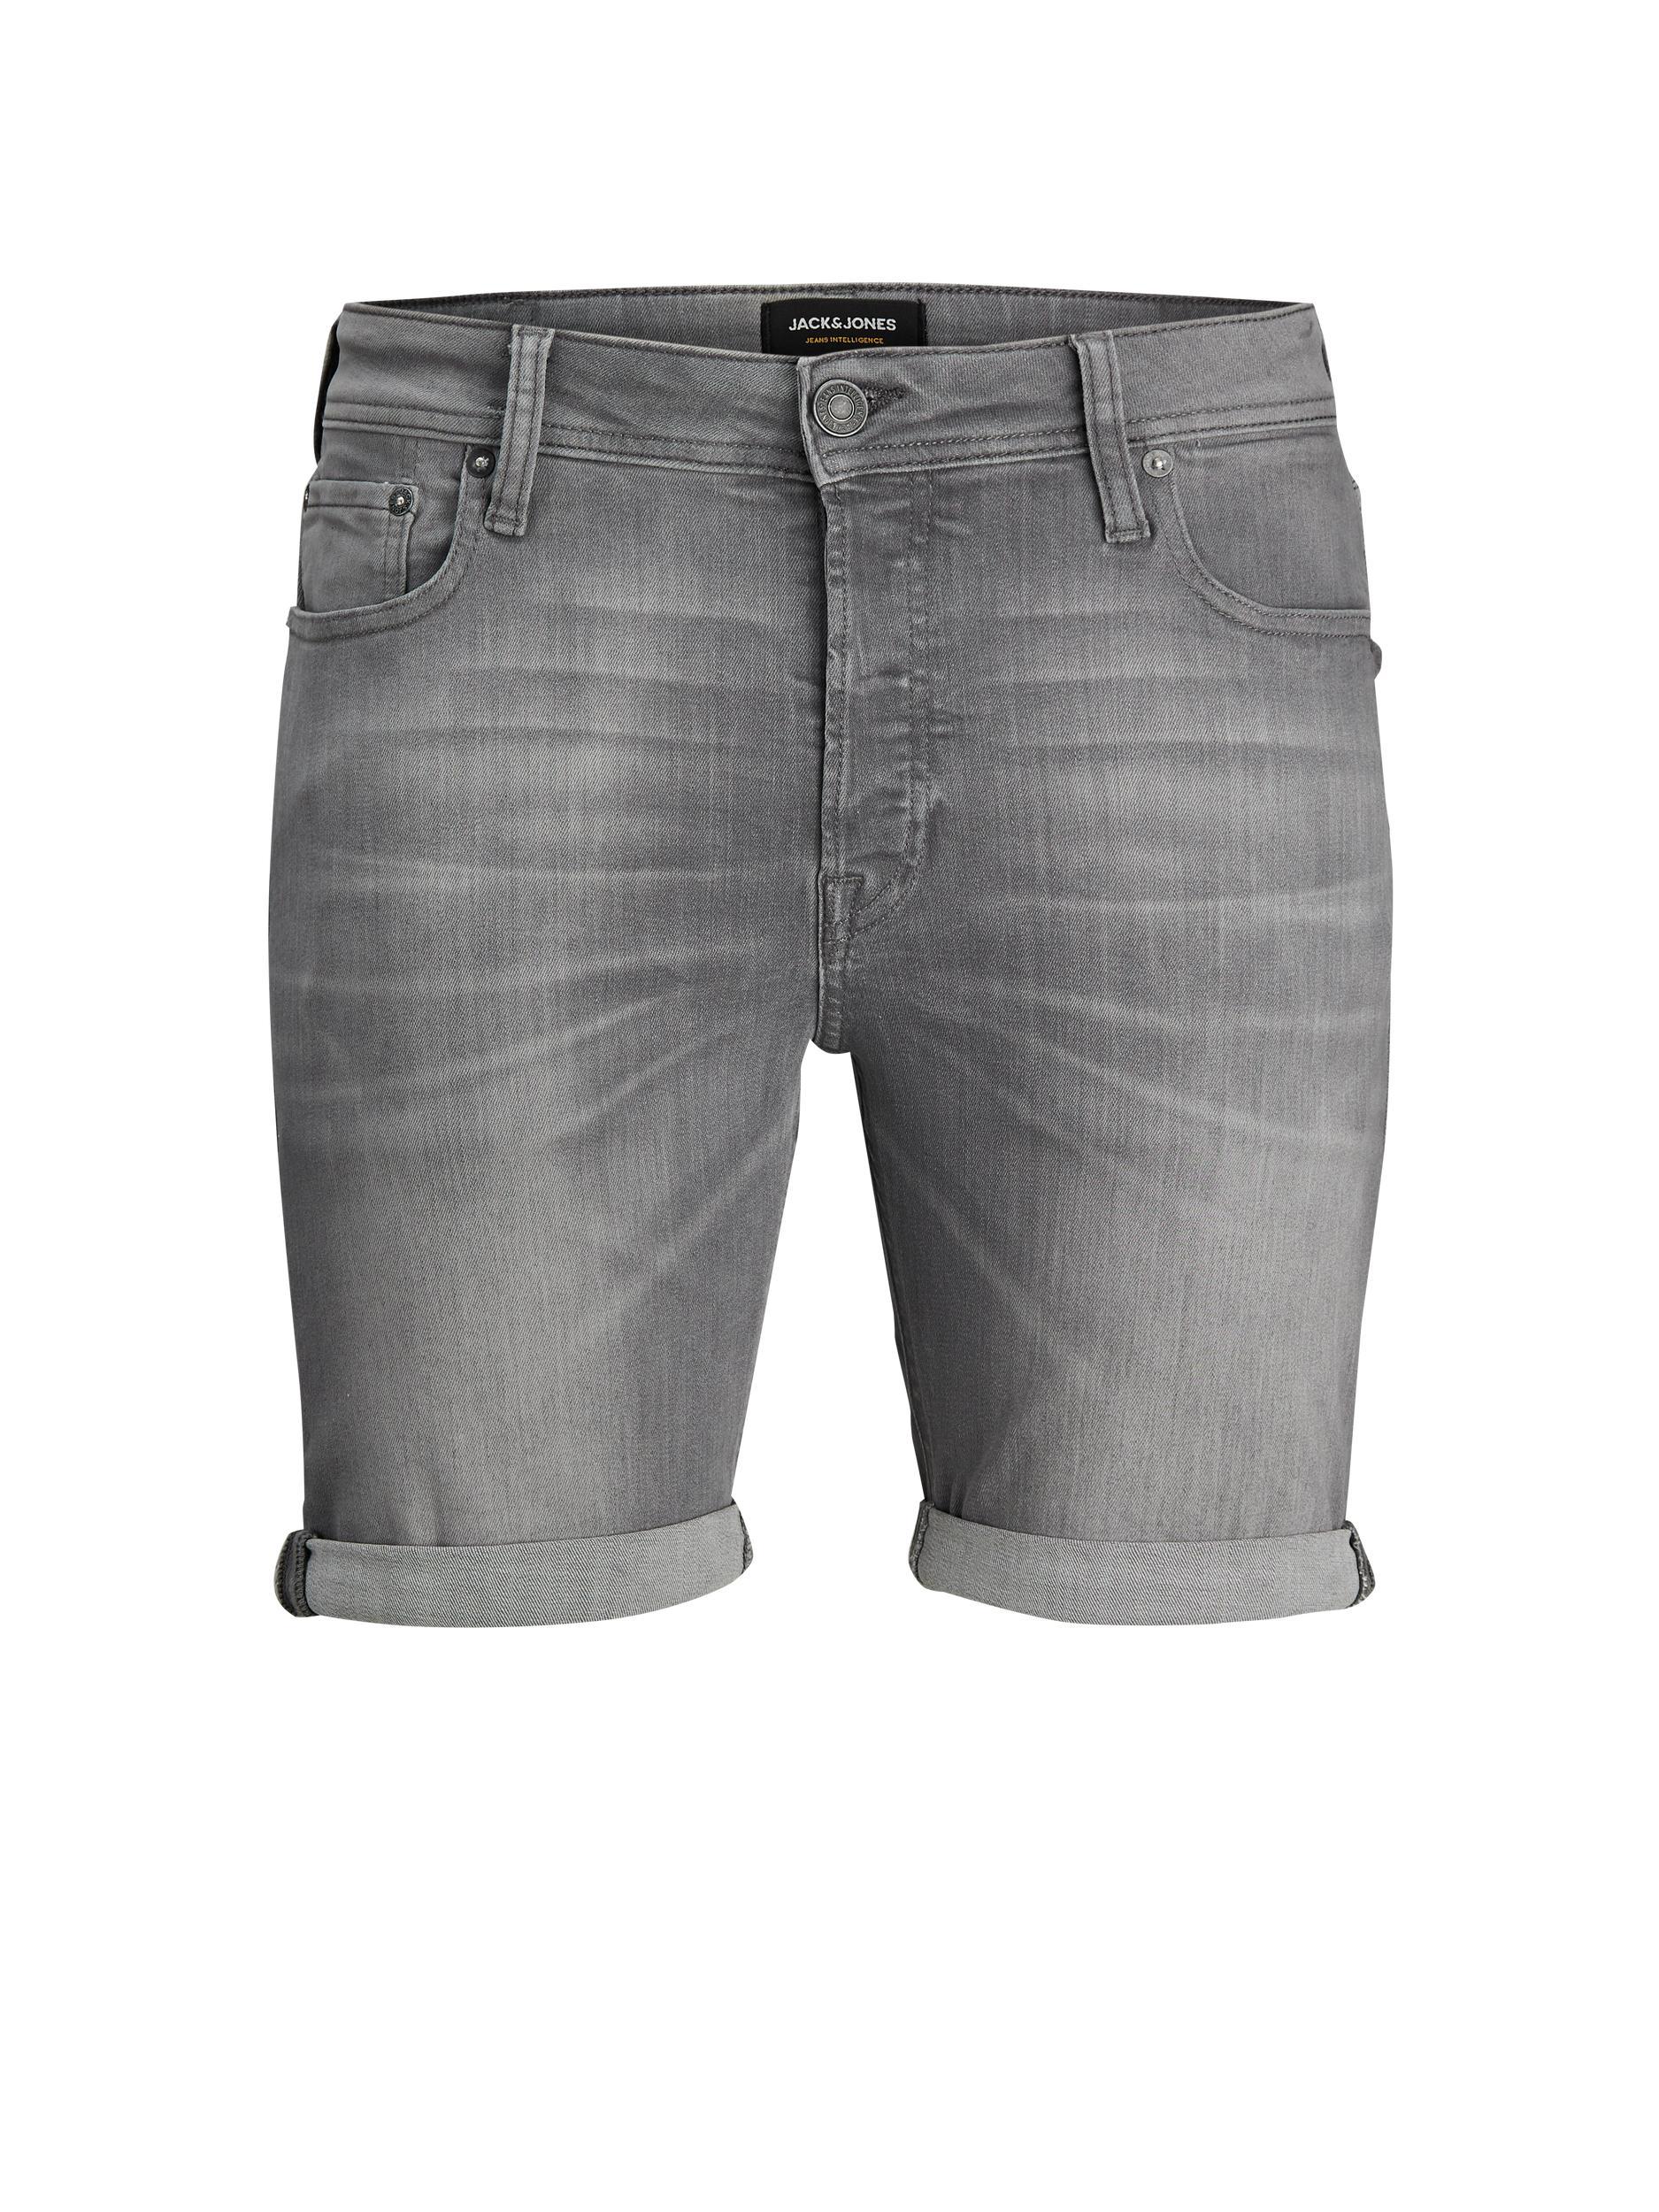 JJIRICK JJORIGINAL SHORTS AGI 003 JACK&JONES | Shorts | 12166861GREY DENIM